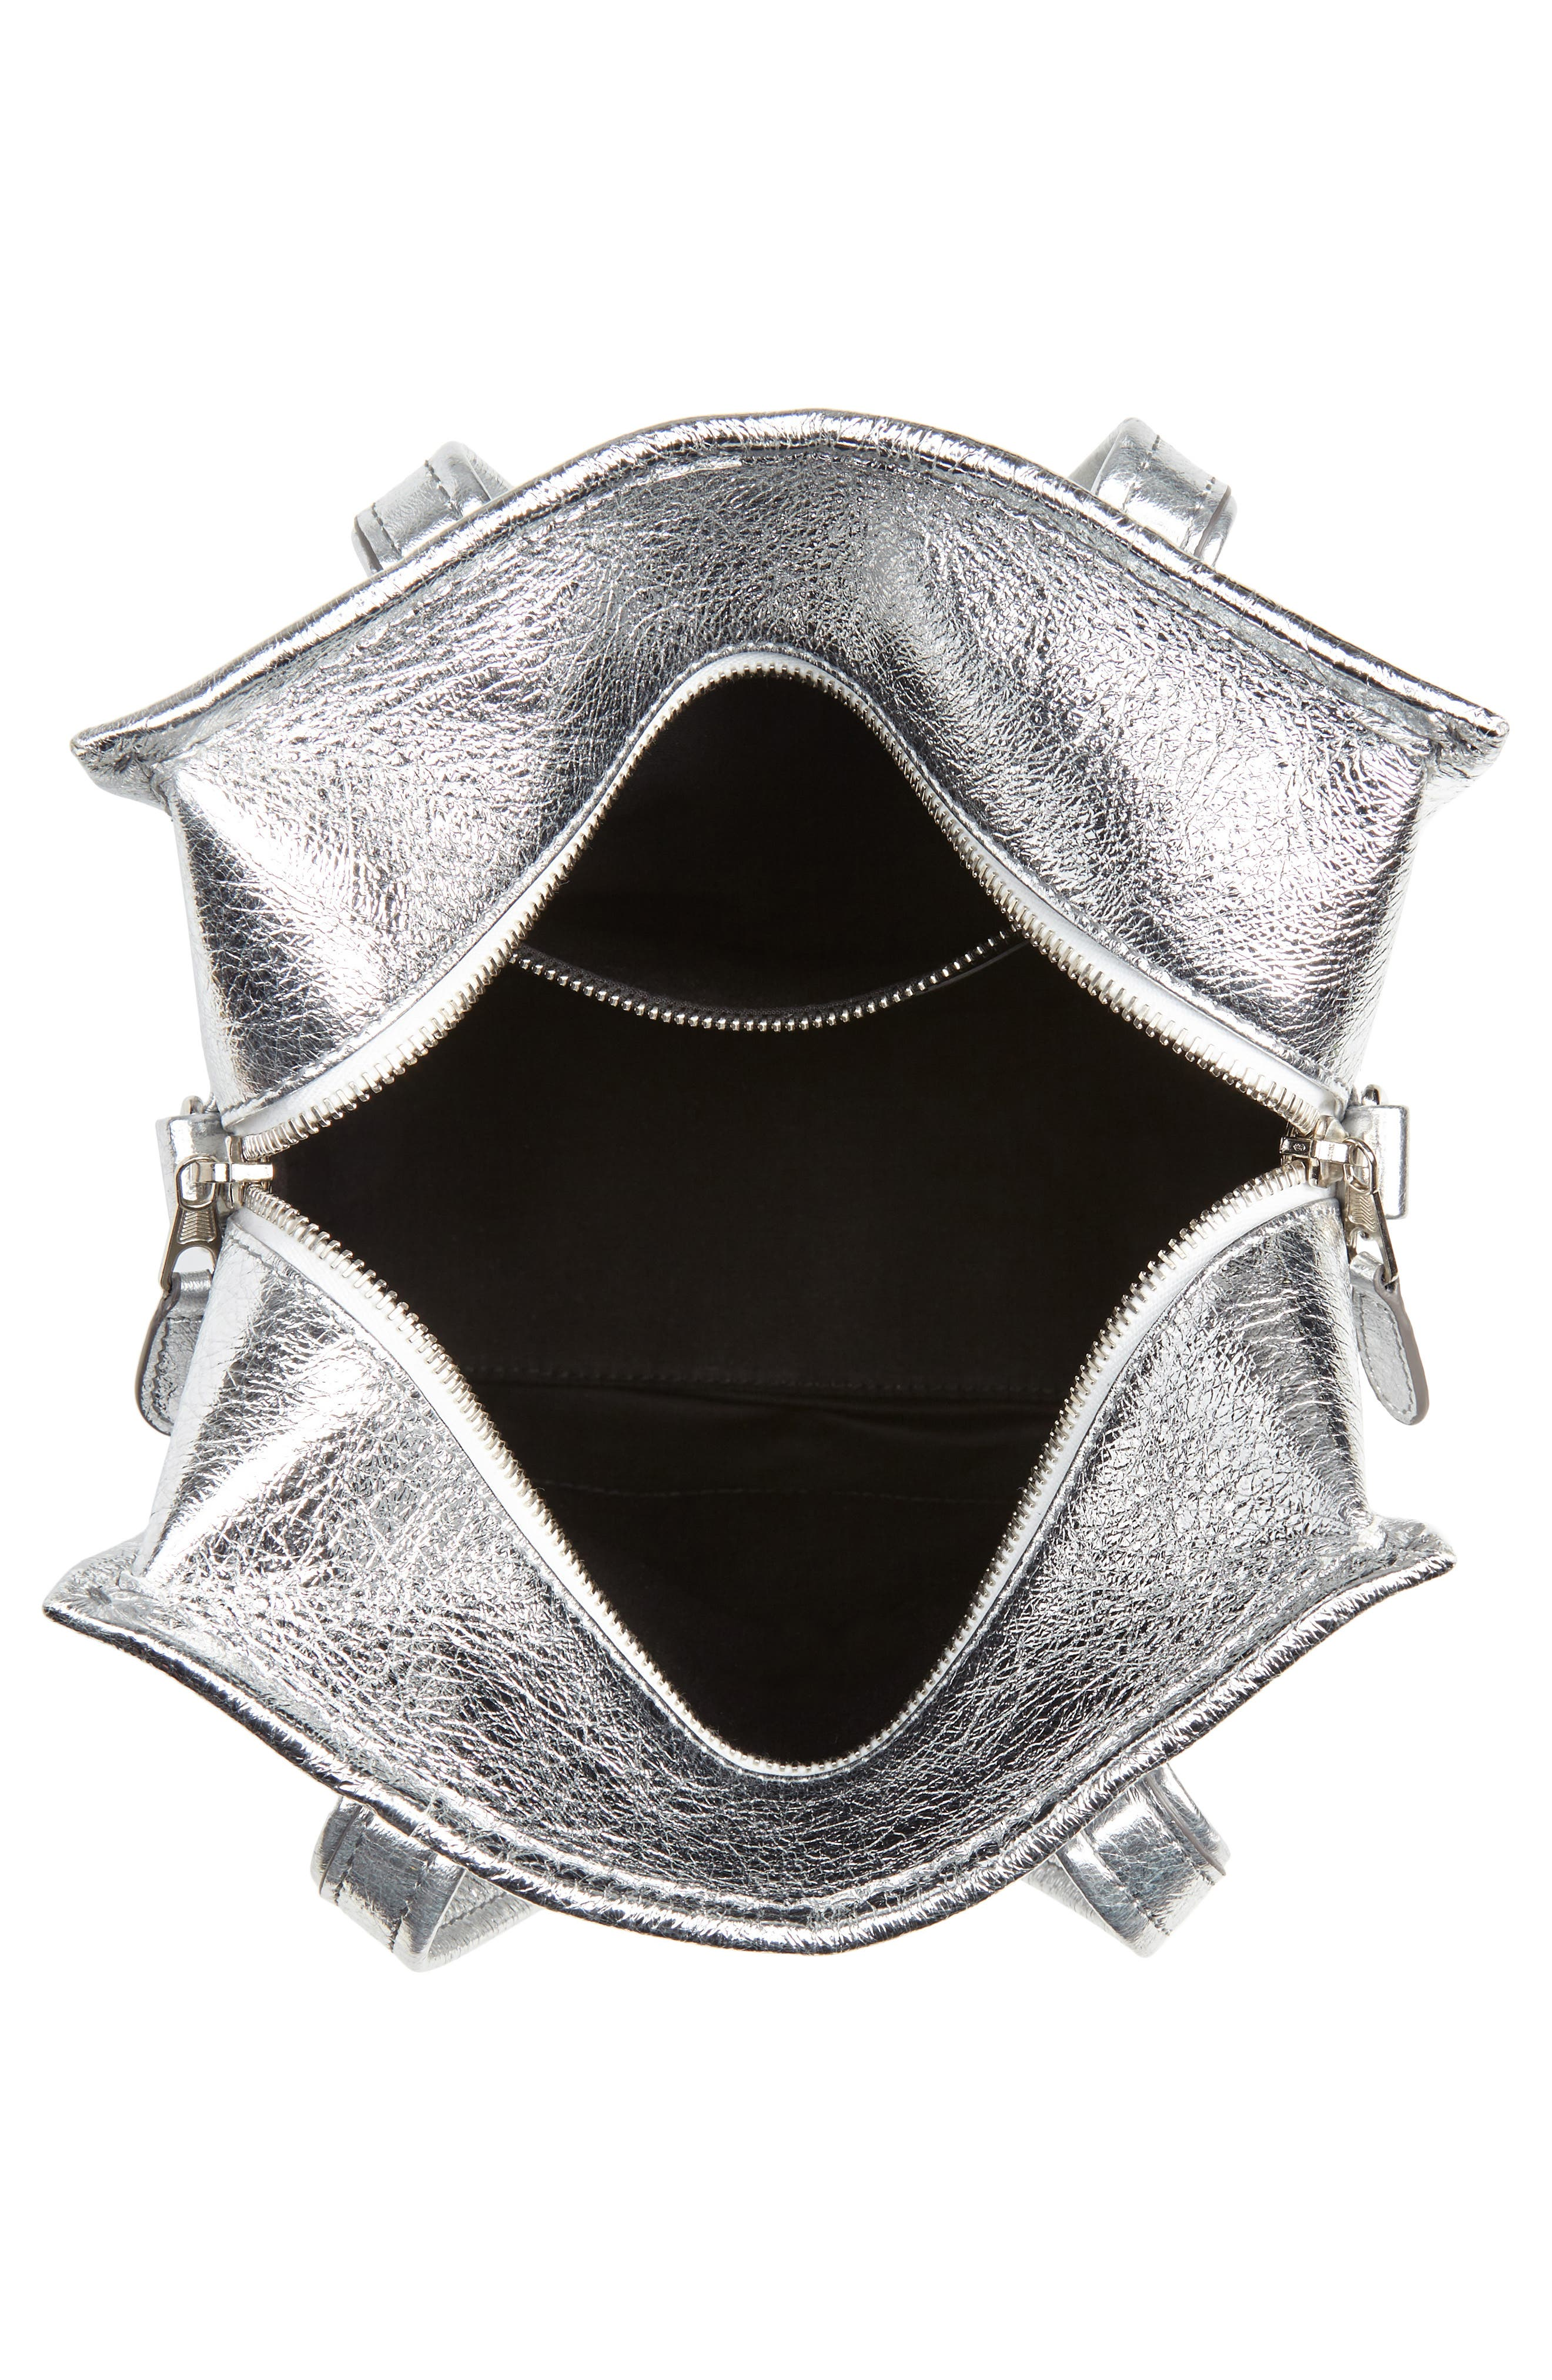 Extra Small Bazar Metallic Lambskin Leather Shopper,                             Alternate thumbnail 4, color,                             ARGENT